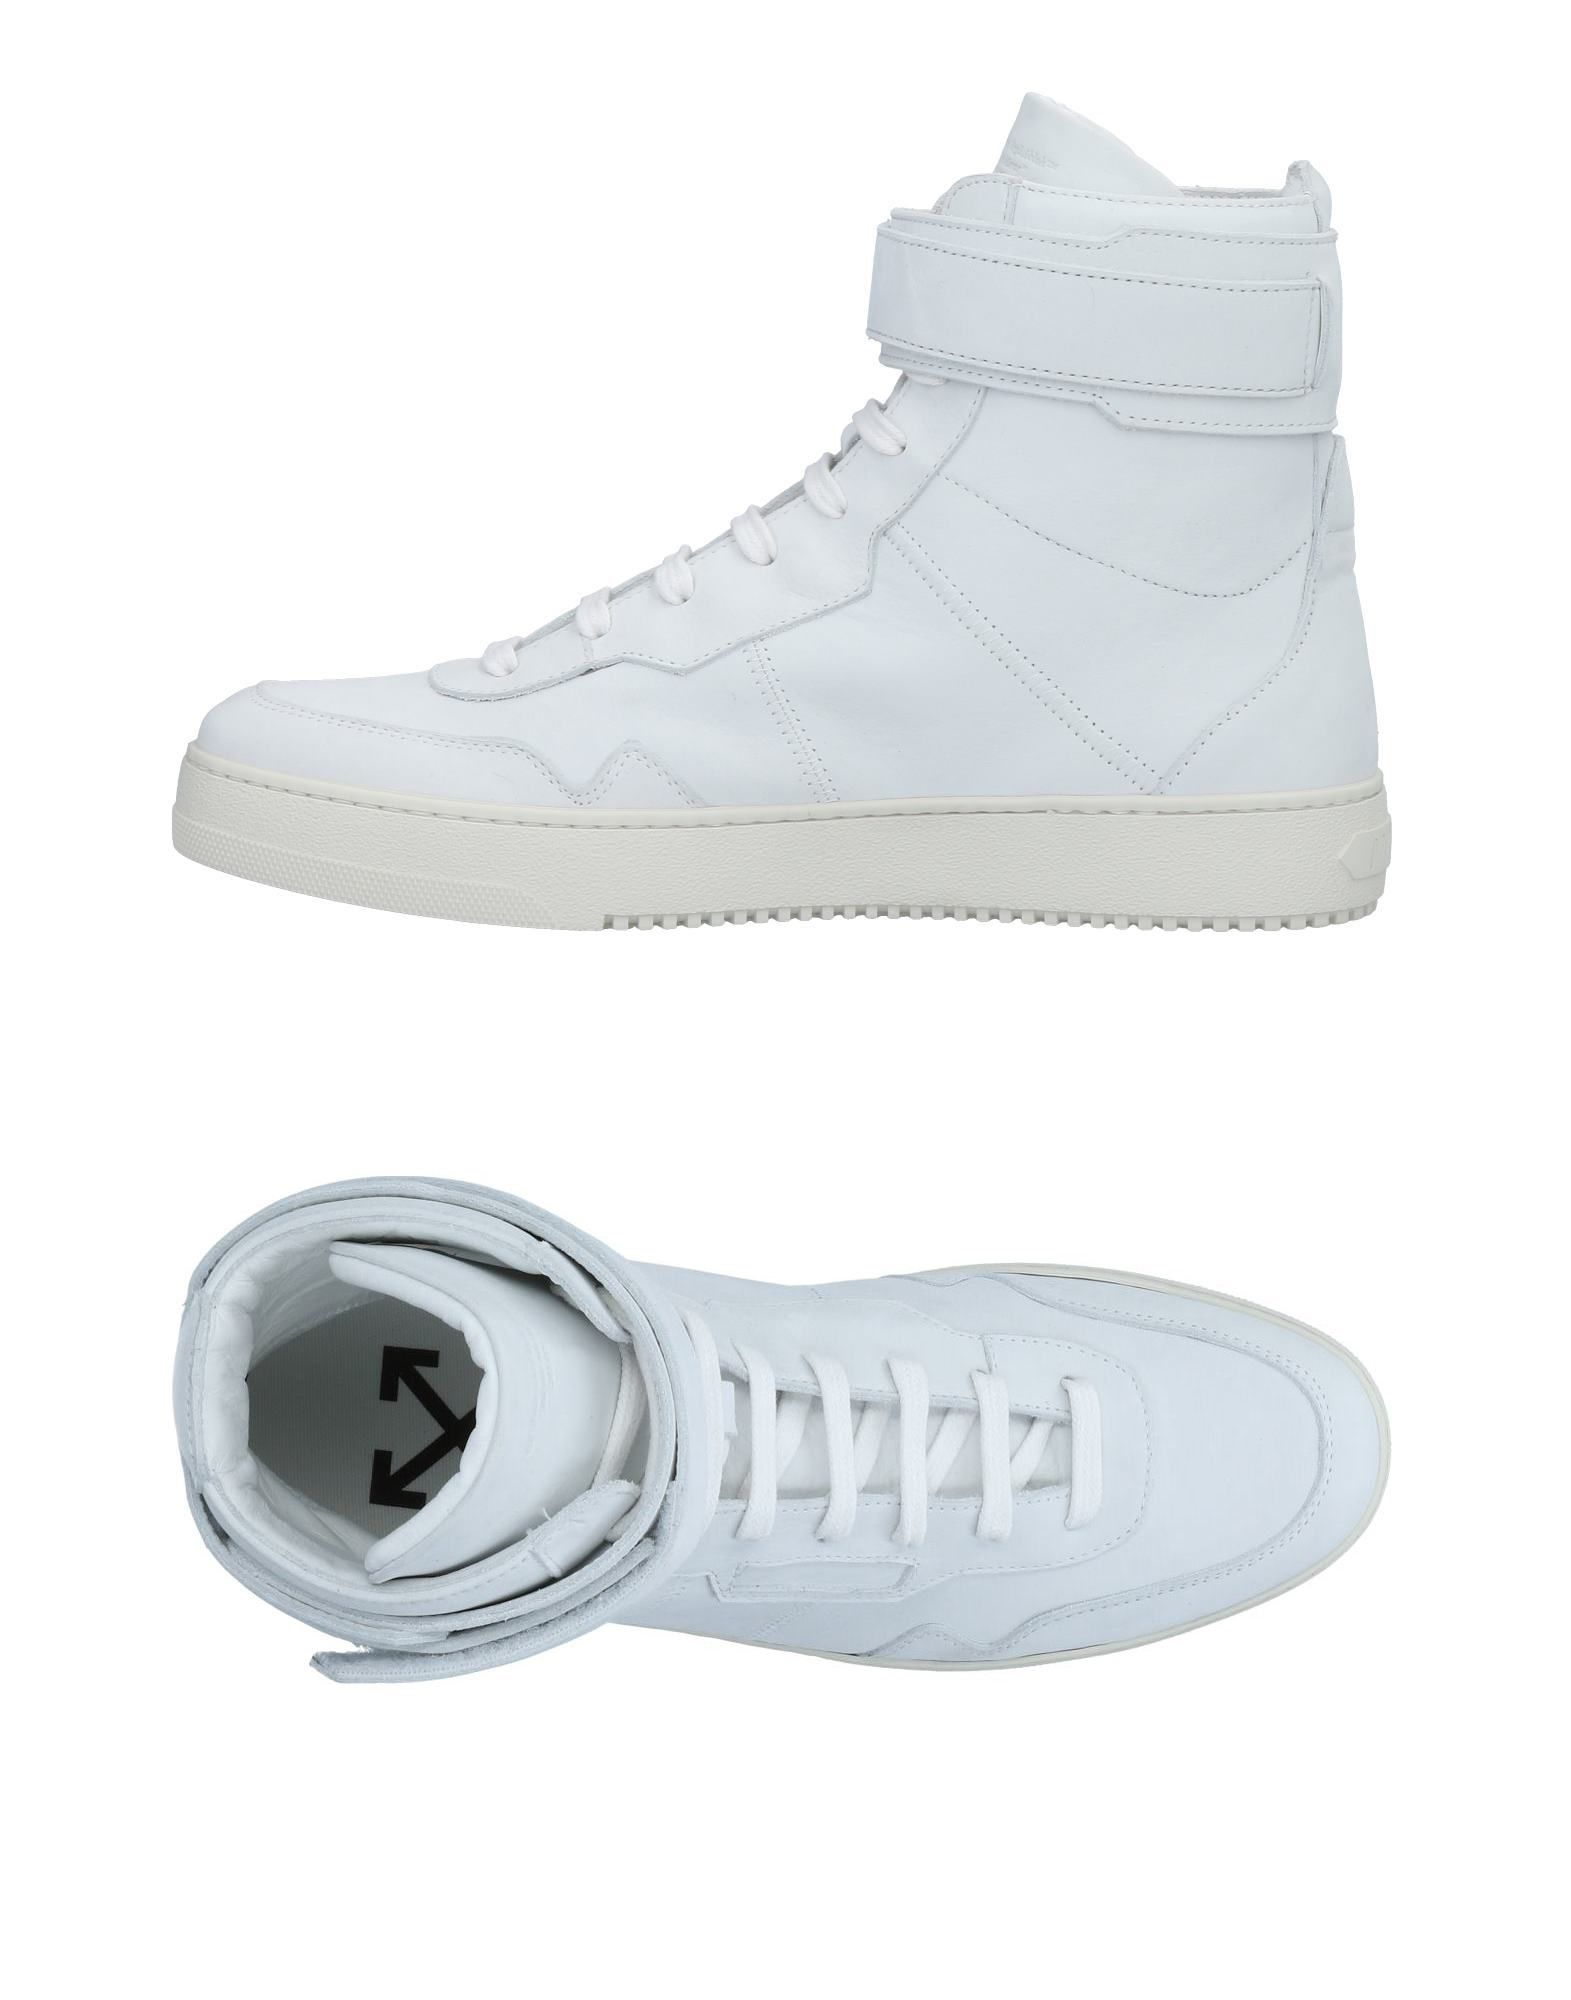 OFF-WHITE™ Высокие кеды и кроссовки кеды кроссовки высокие детские dc rebound se green black white